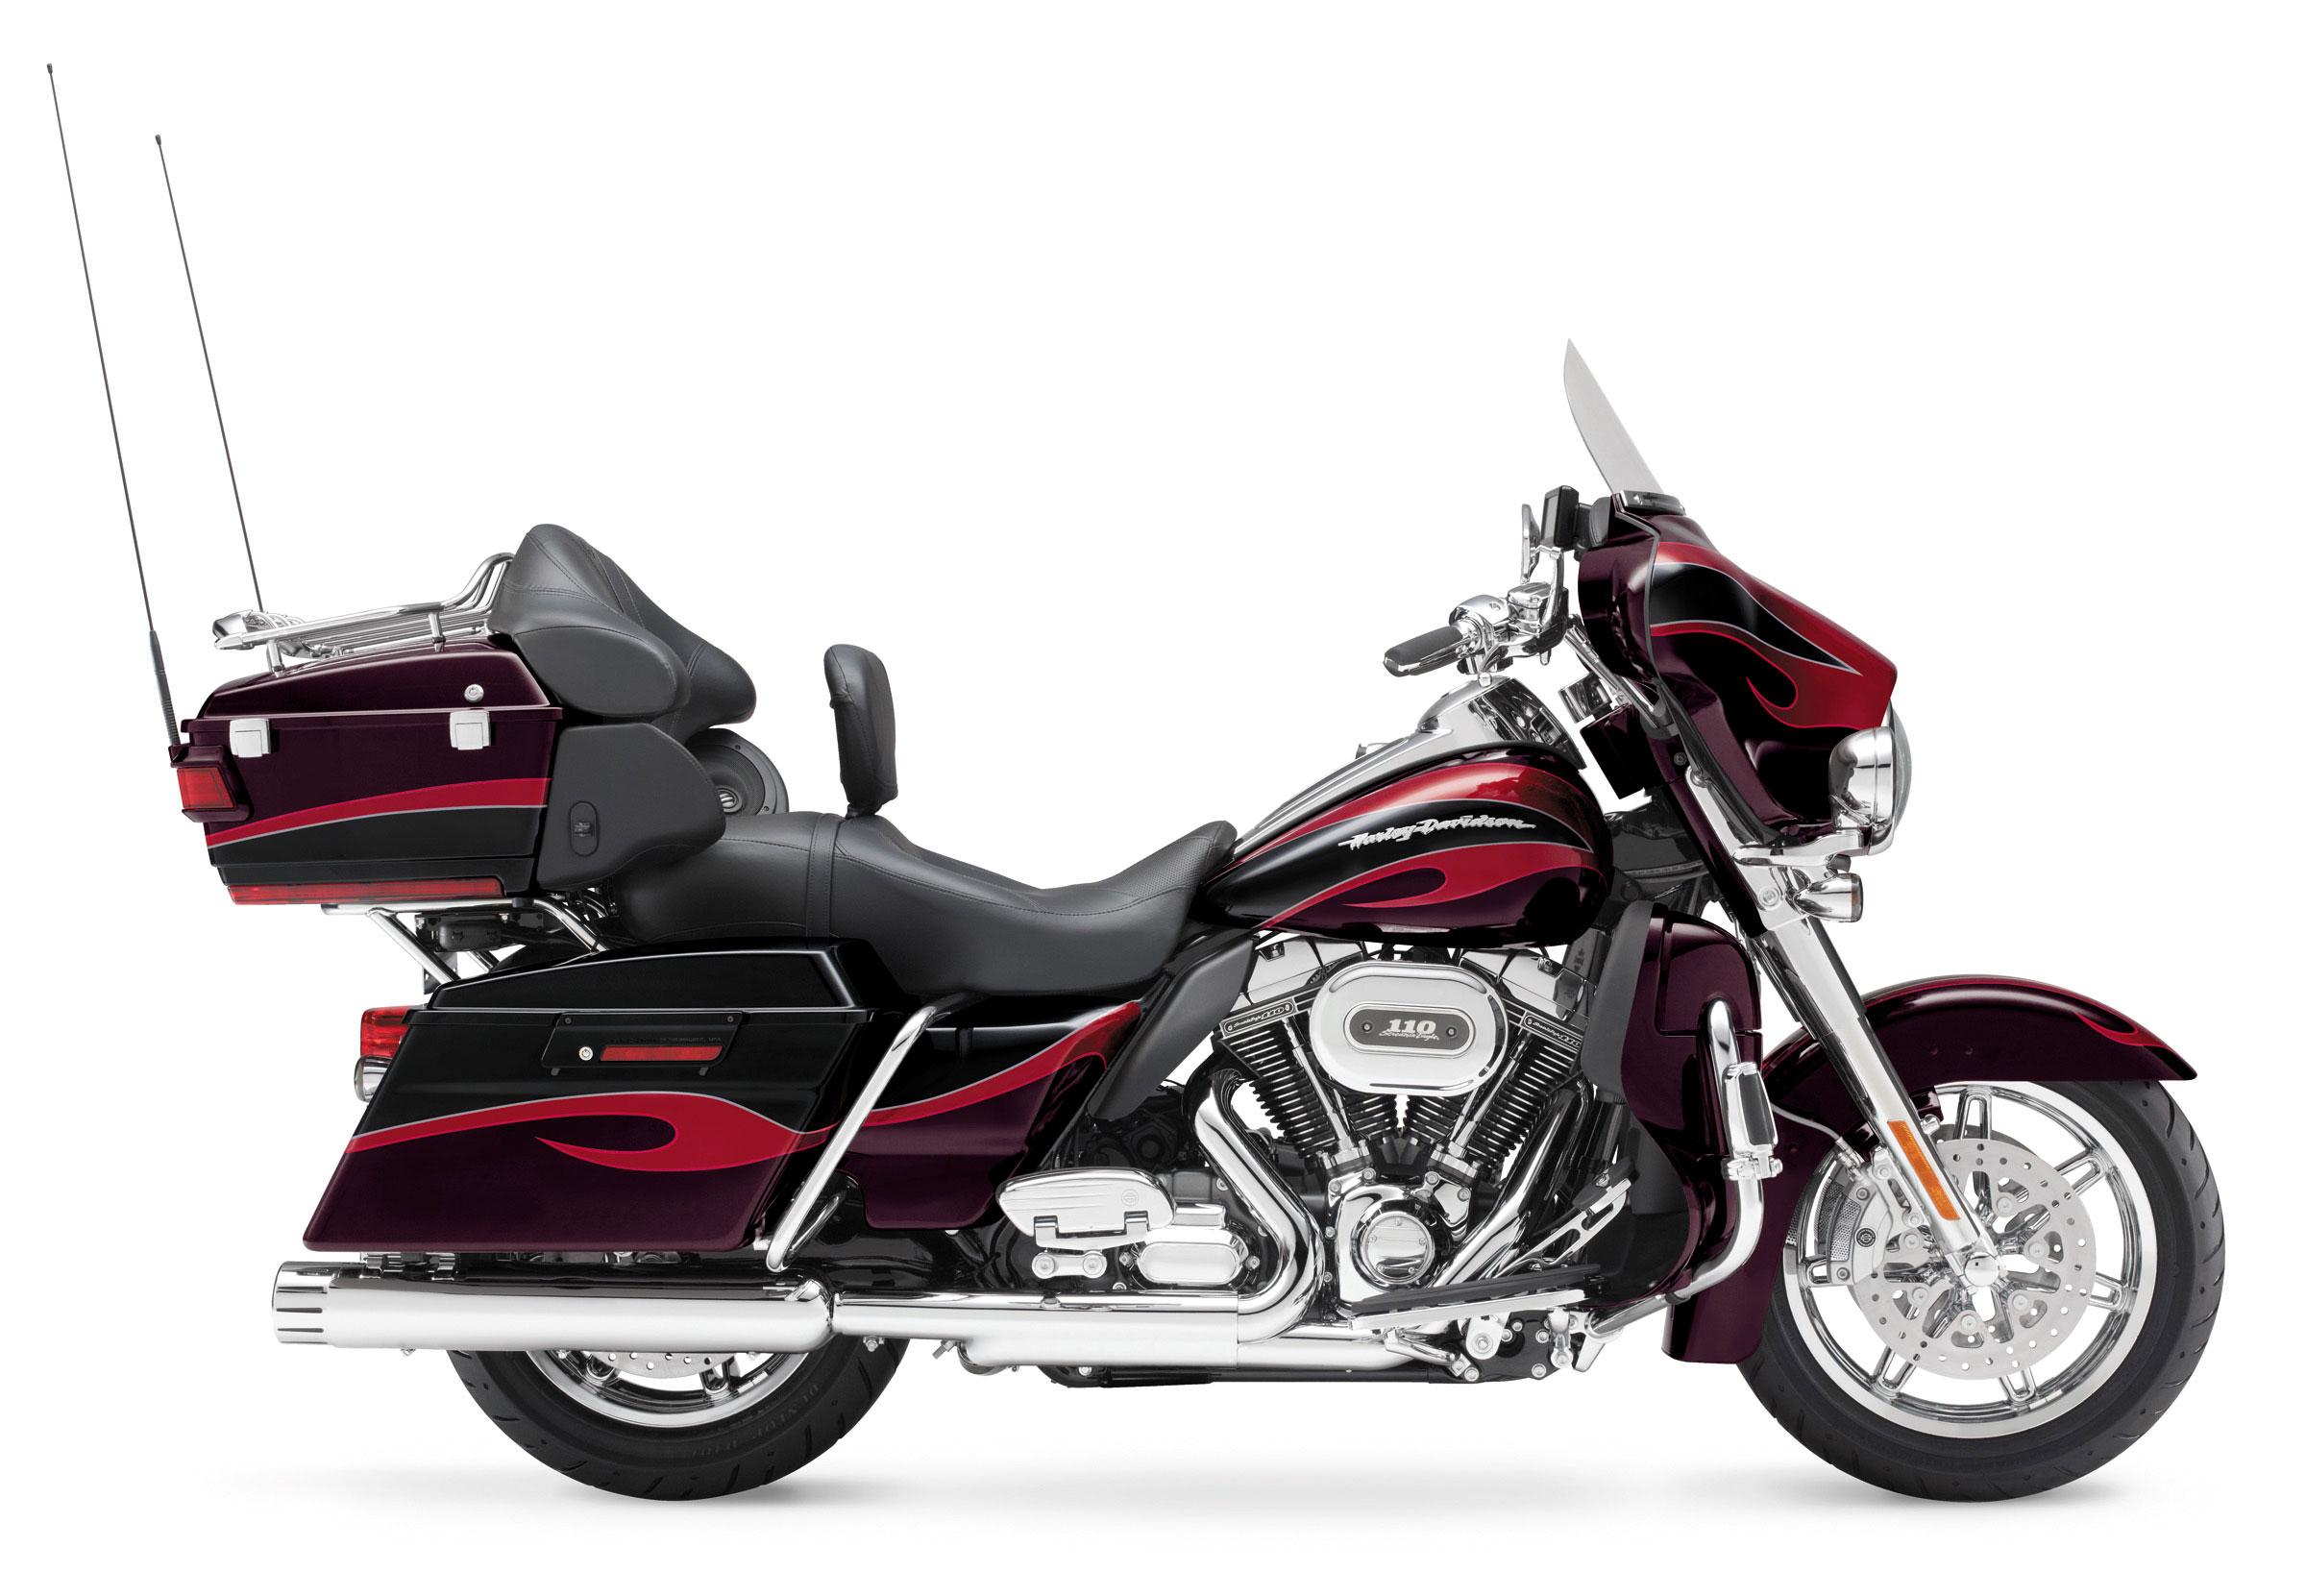 Harley Davidson Cvo Electra Glide Ultra Classic Specs